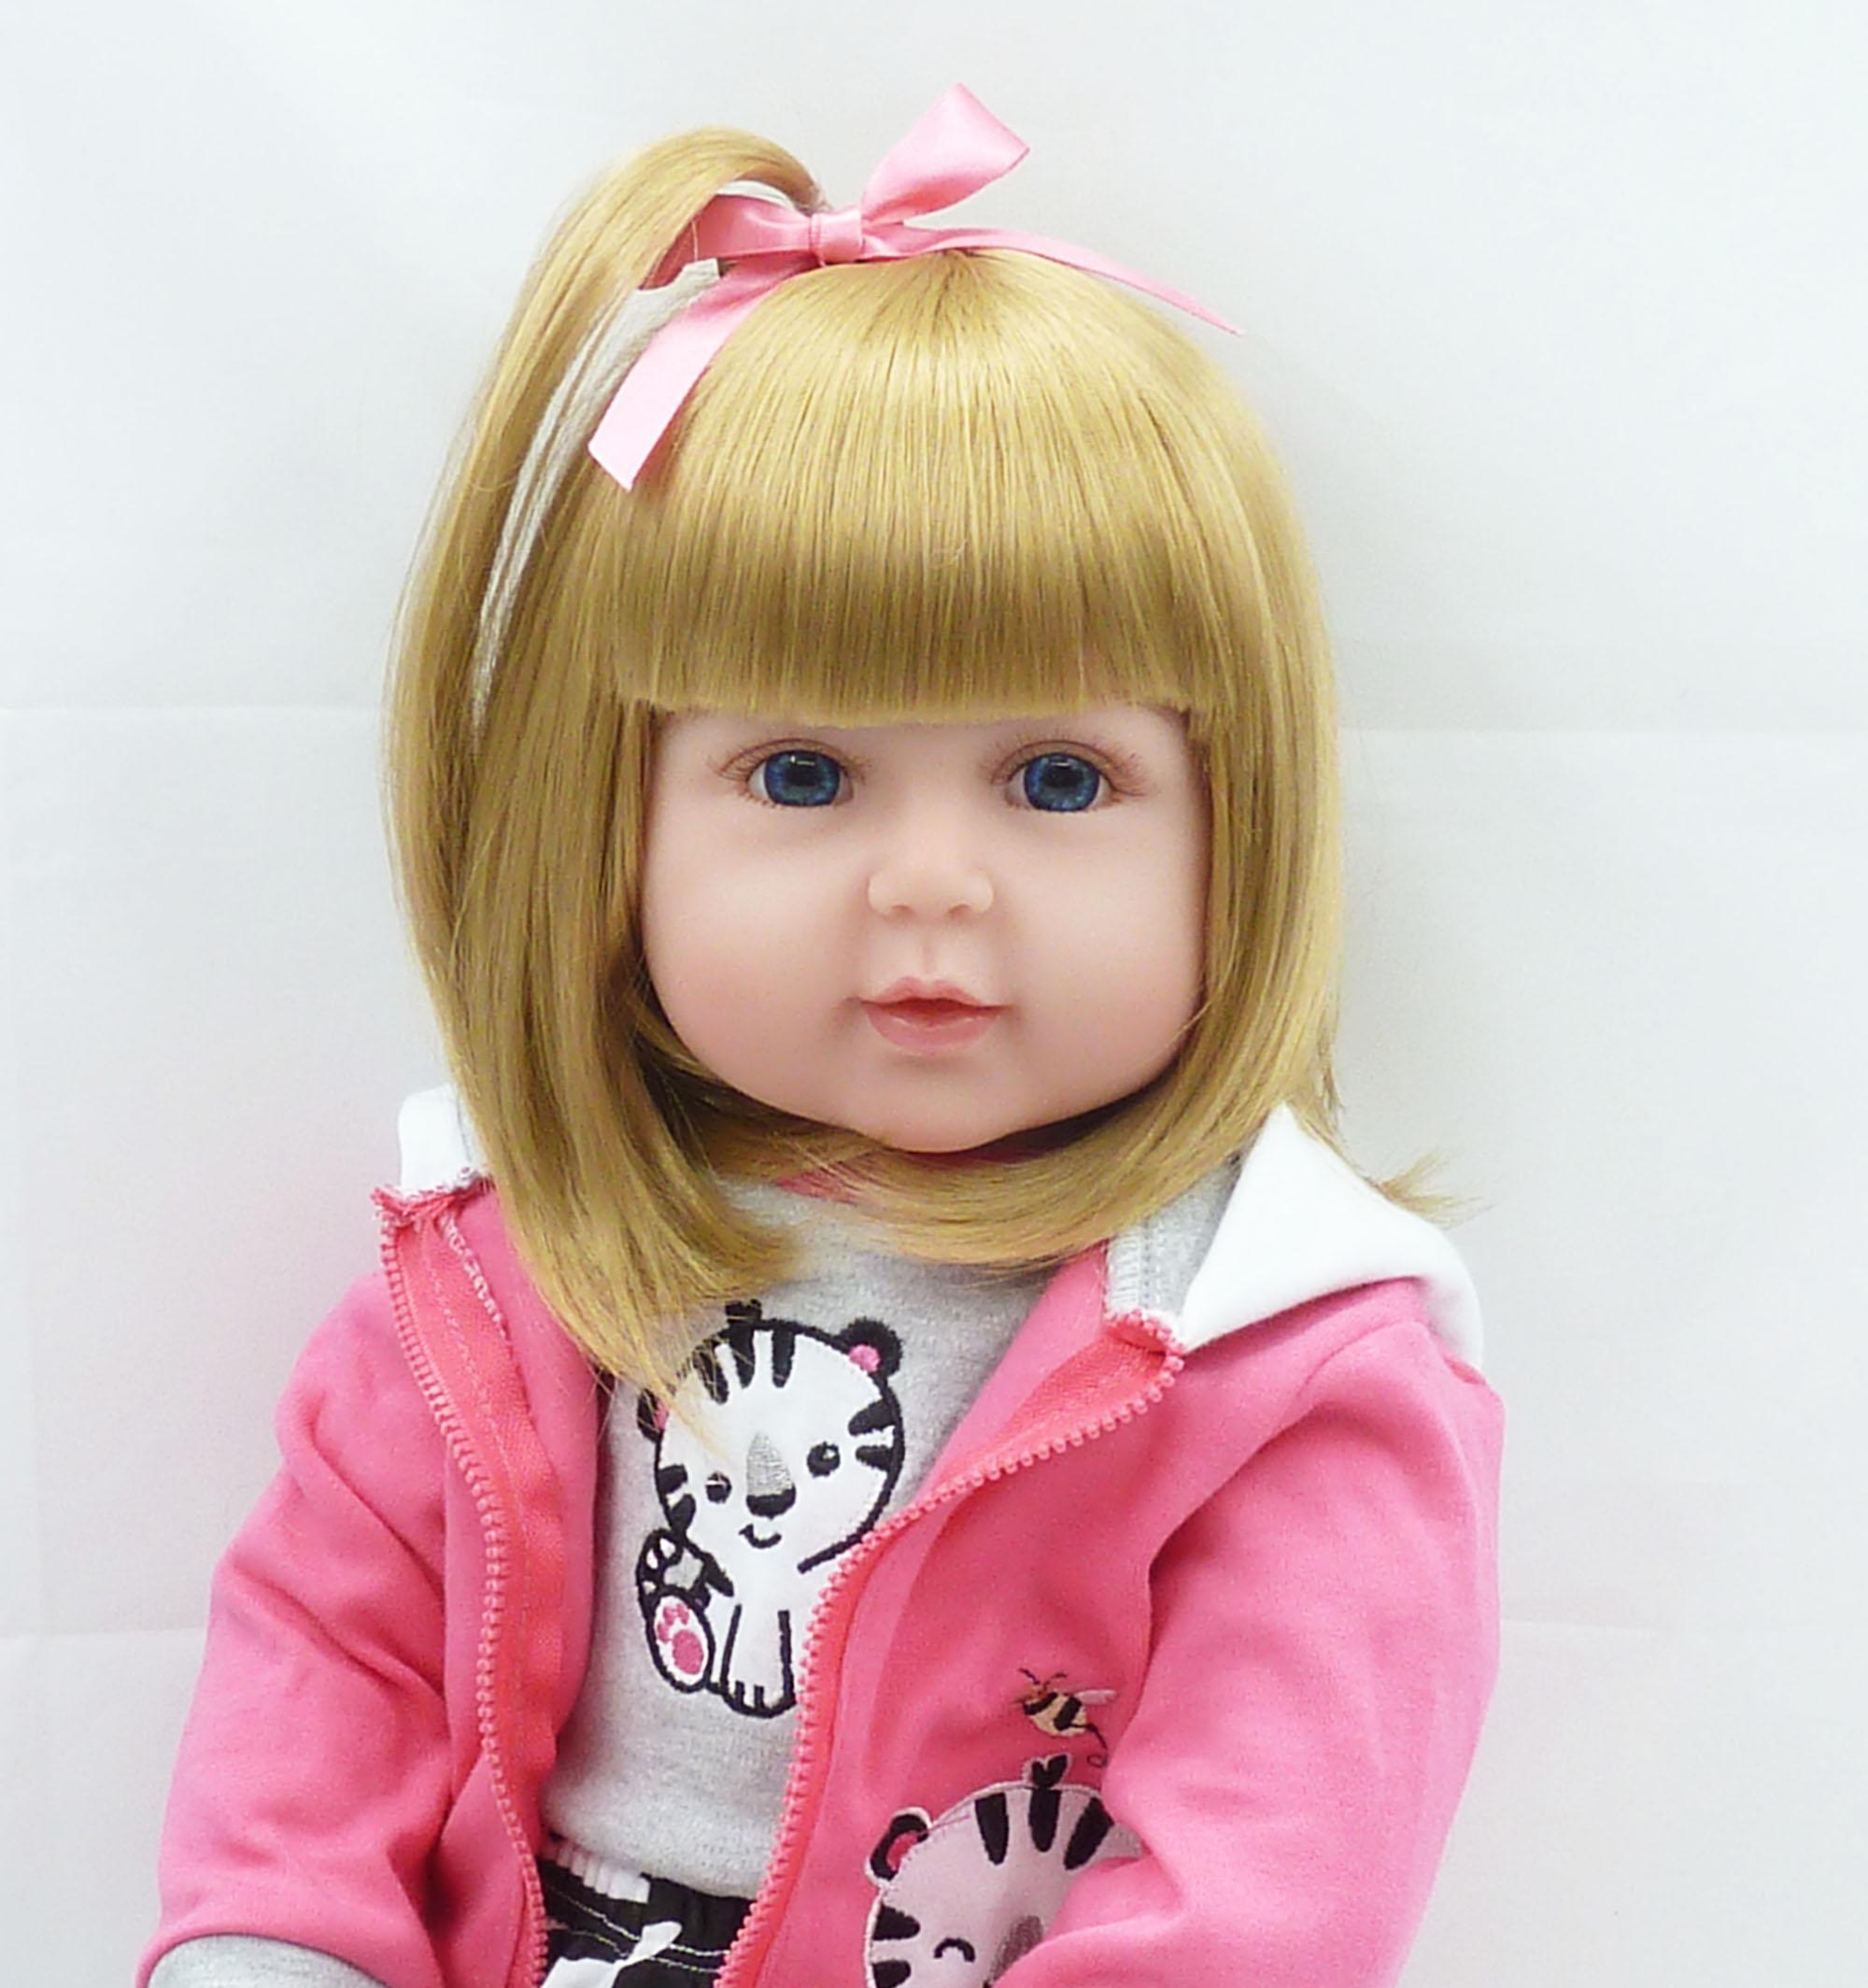 61cm Soft Silicone Reborn Baby Doll Princess Babies Dolls With Gold Hair Kids Birthday Christmas Gift Girls Brinquedos